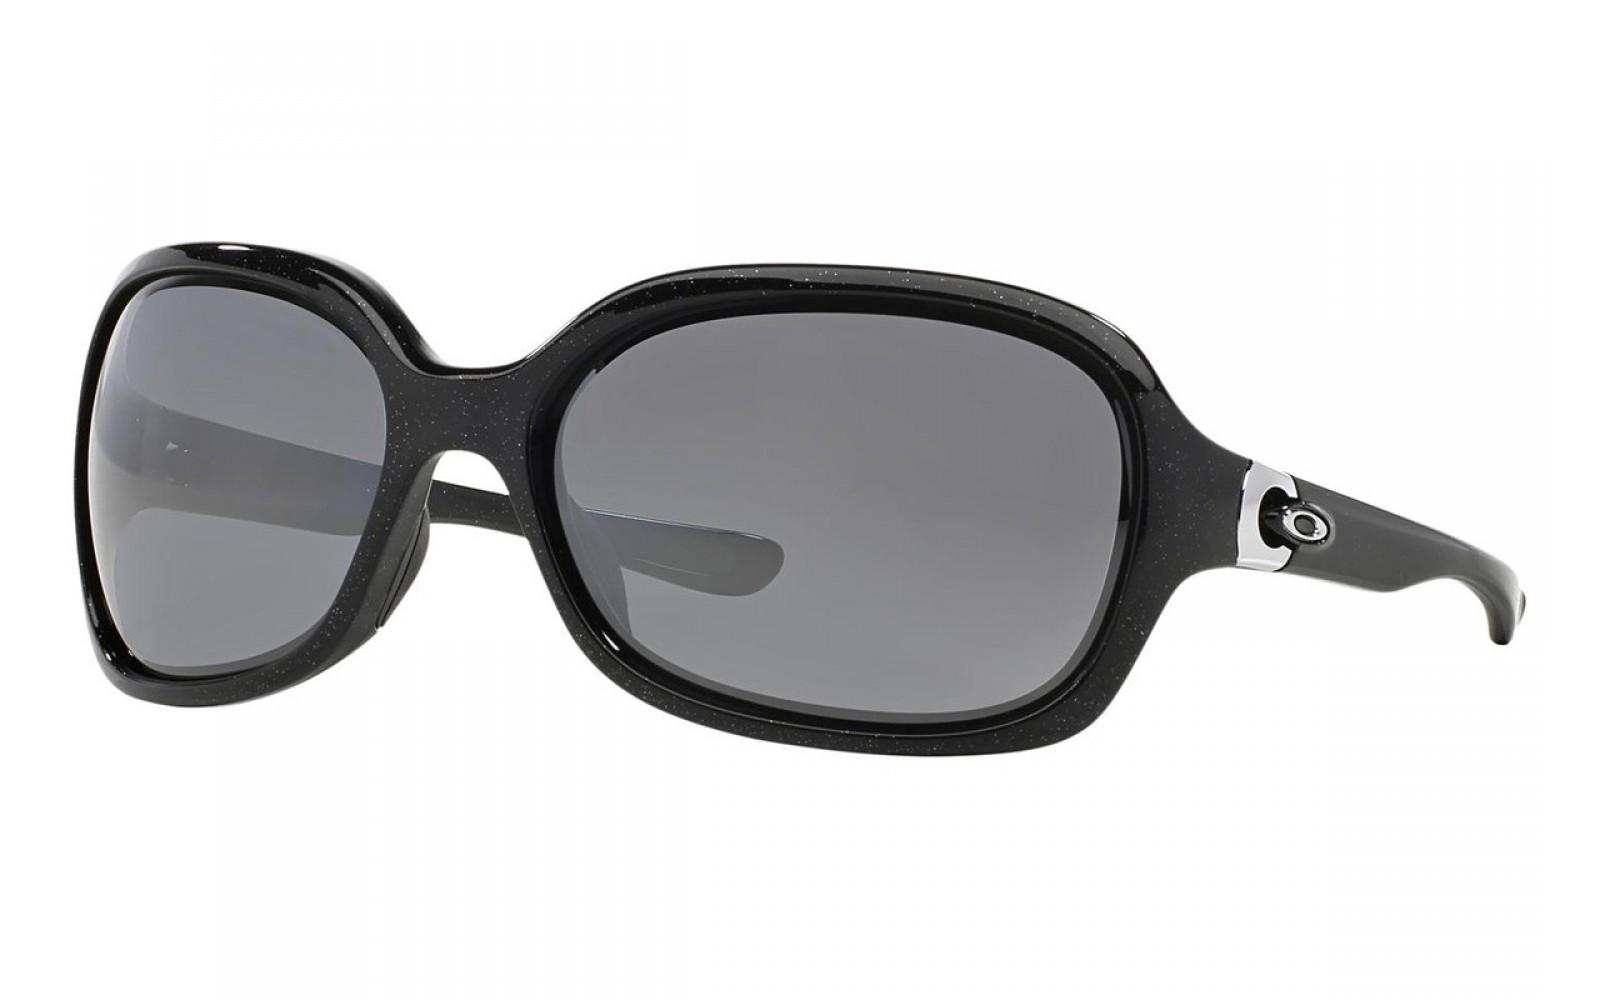 Oakley Pulse - Metallic Black / Black Iridium - OO9198-13 Zonnebril